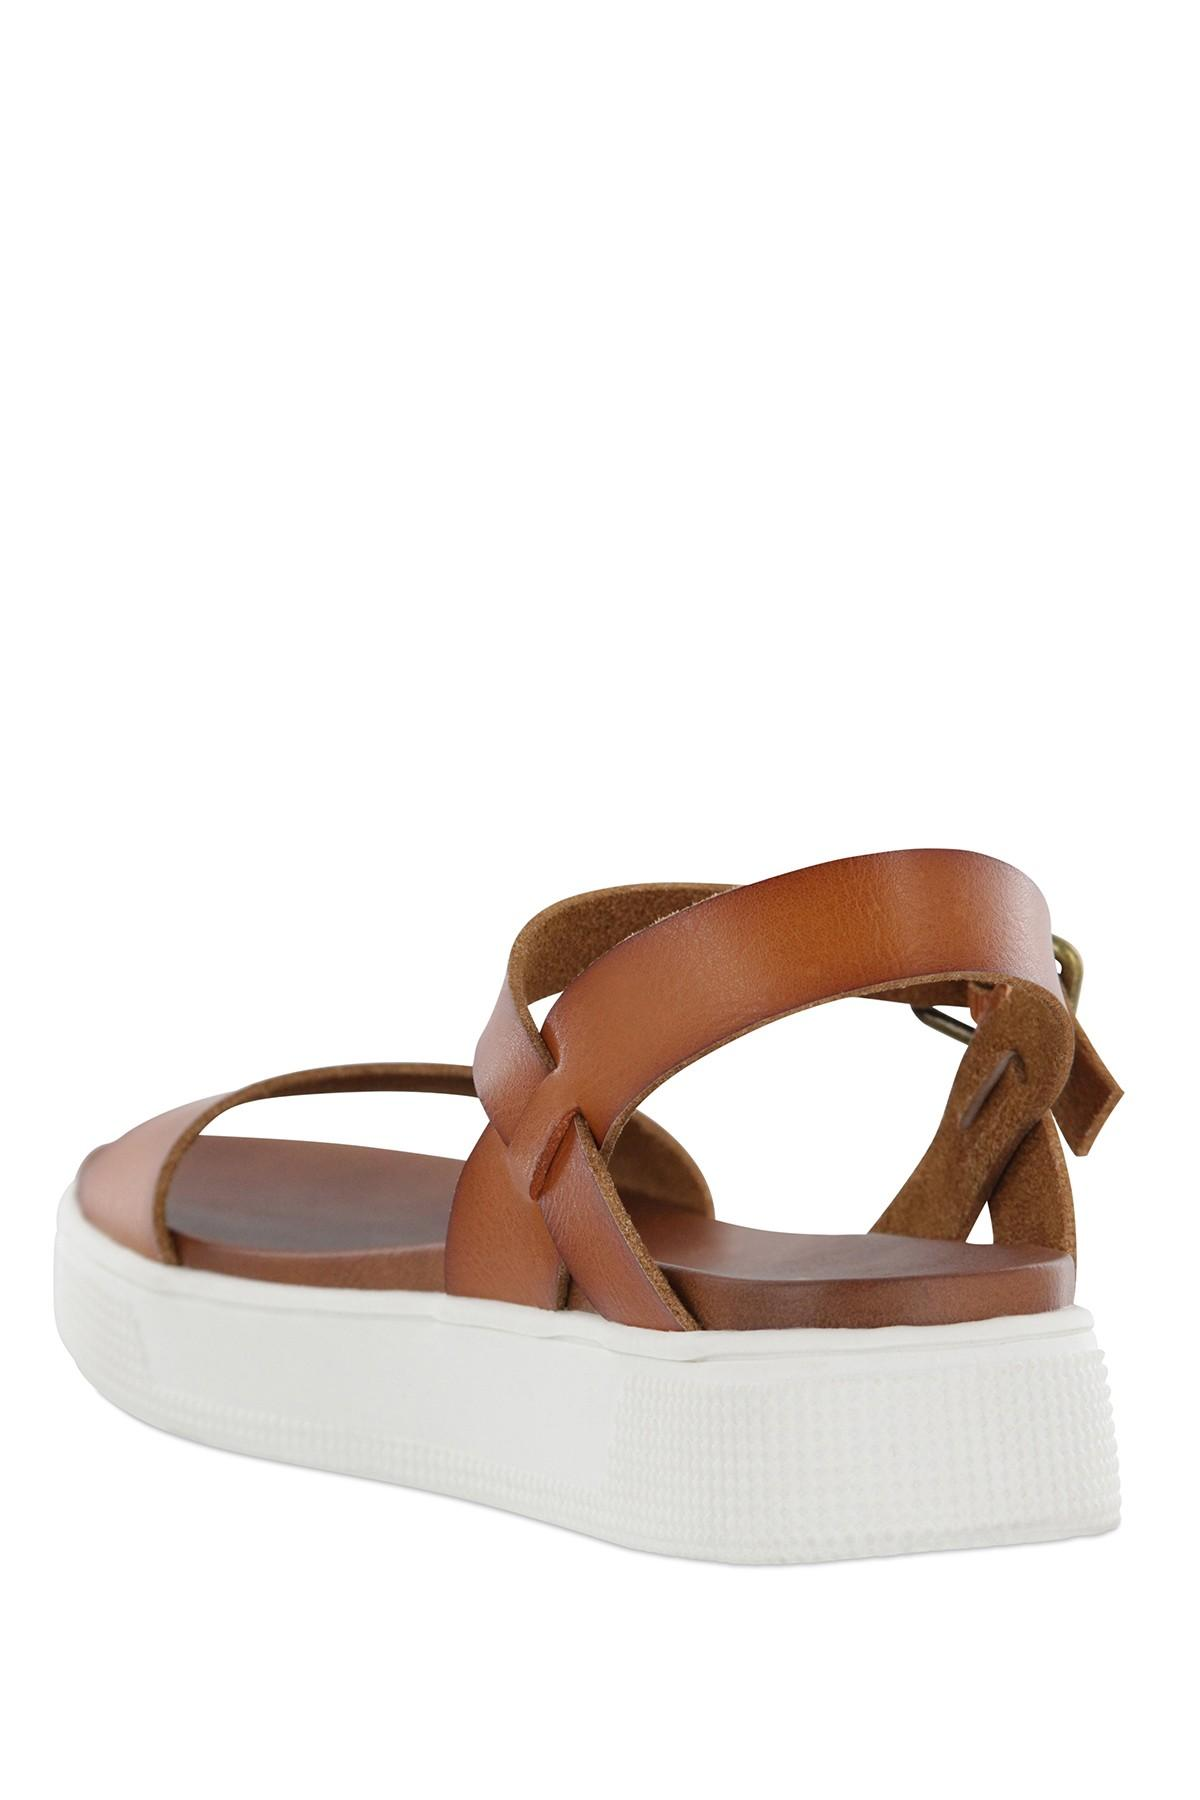 301a207246b Mia brown abby open toe platform sandal view fullscreen jpg 1200x1800  Nordstrom rack mia open toe